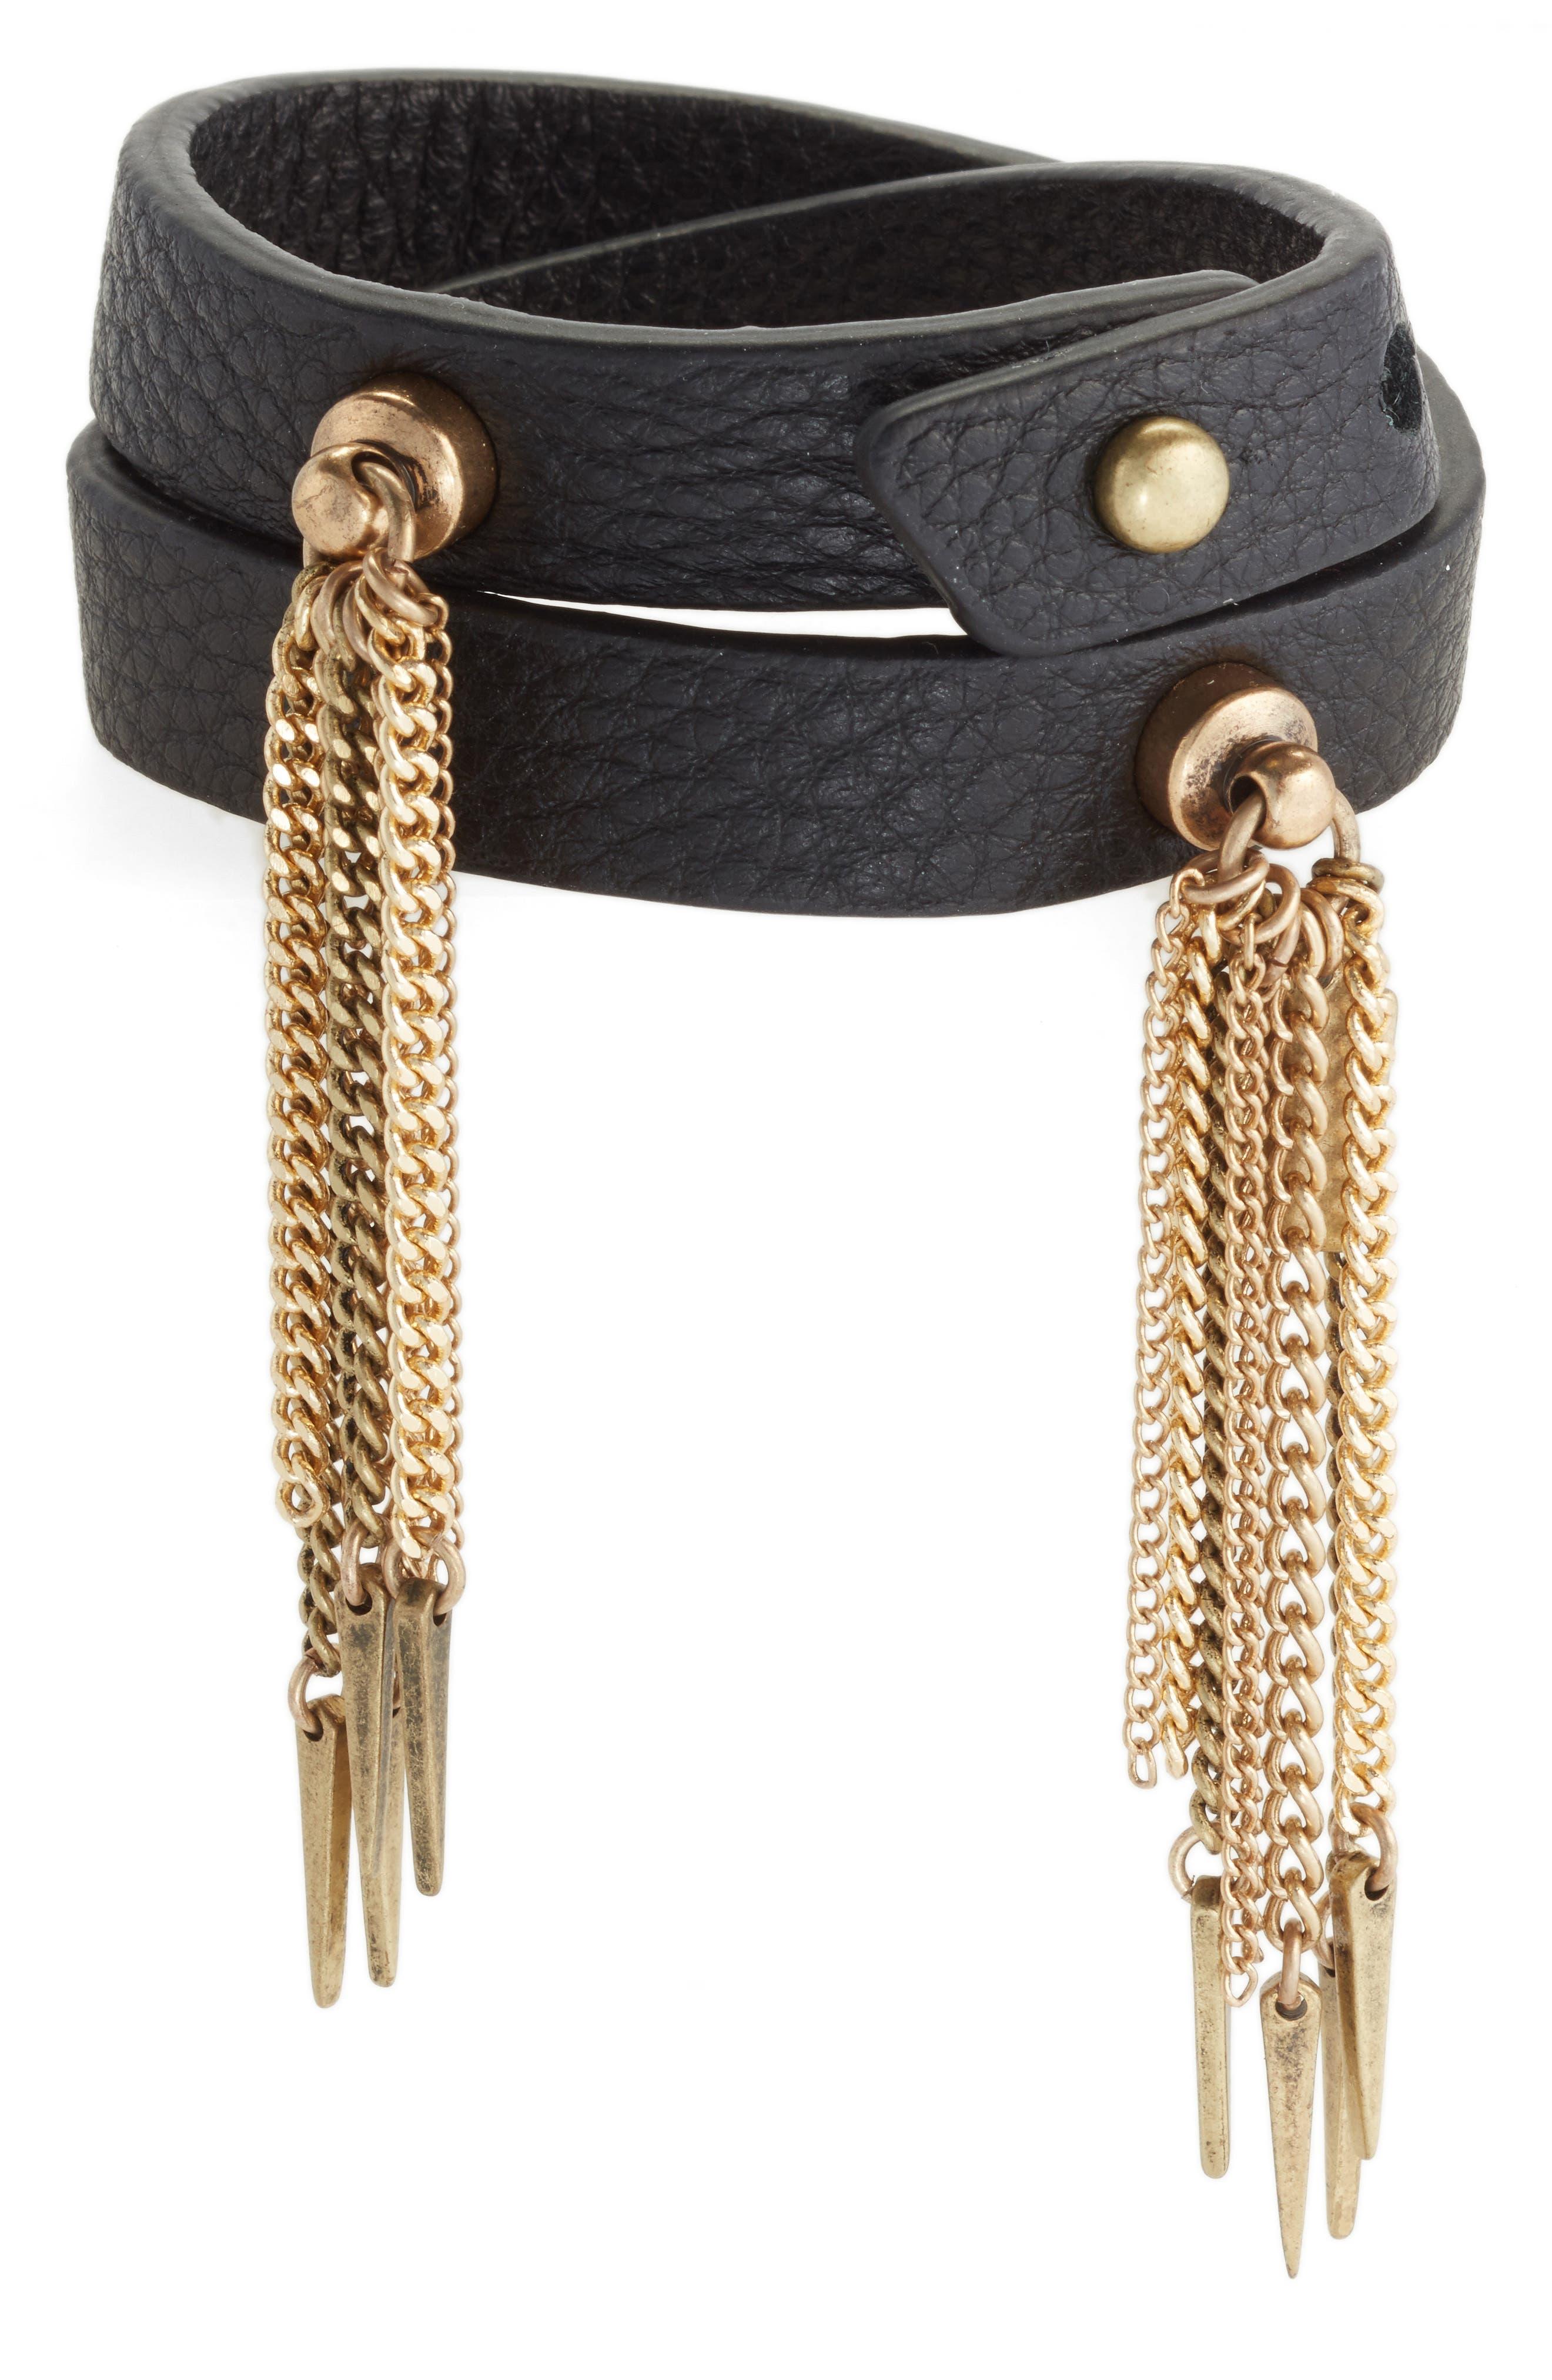 Alternate Image 1 Selected - Jenny Bird Luna Warrior Leather Wrap Bracelet